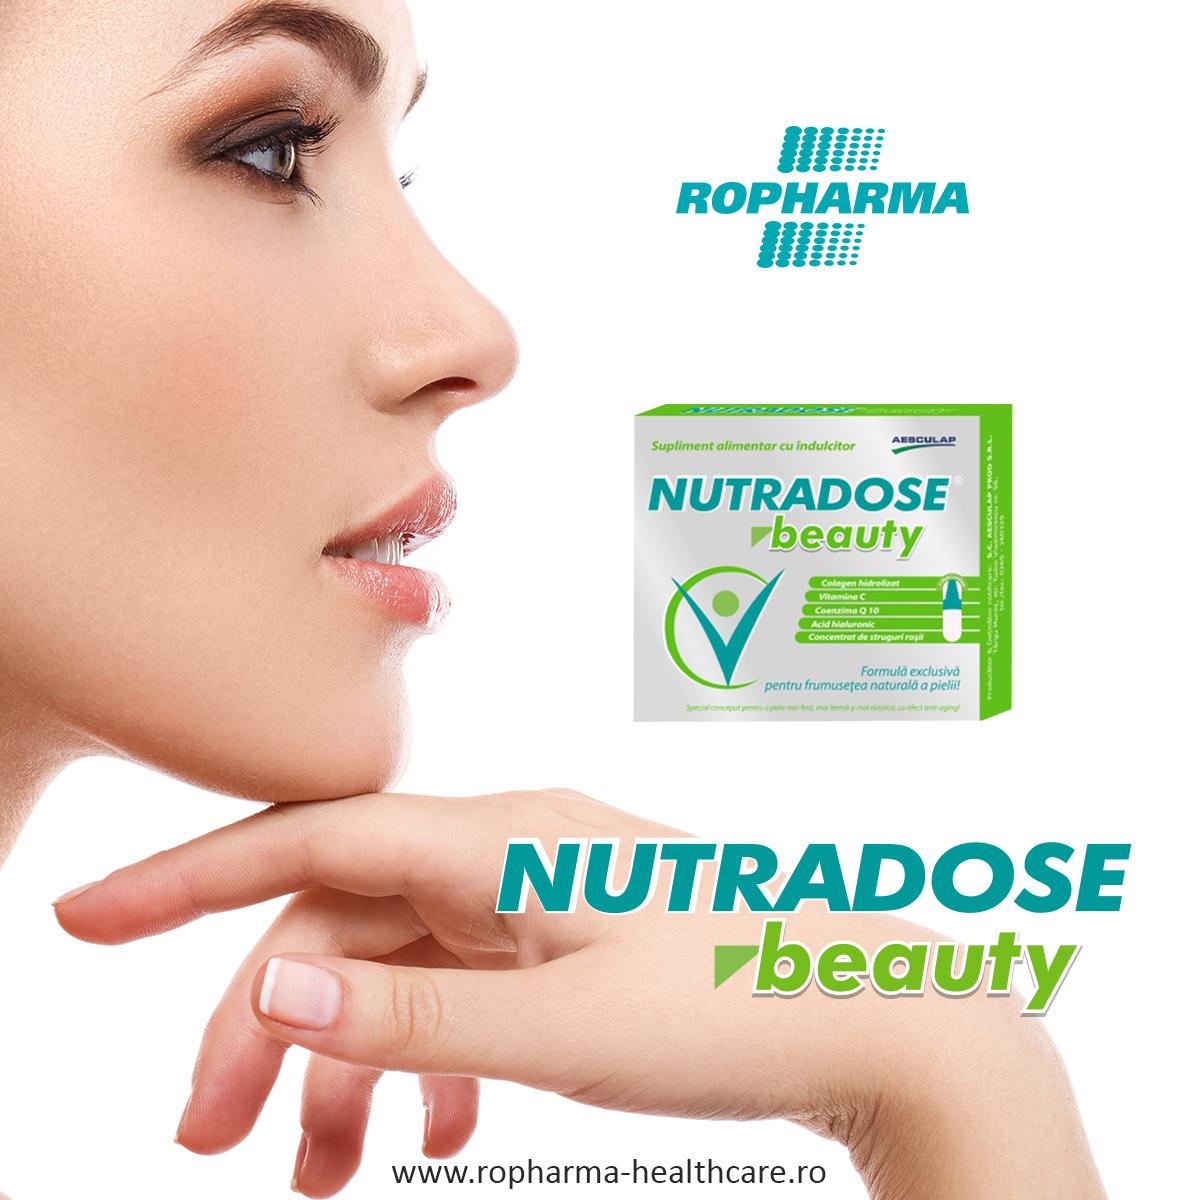 Nutradose Beauty, formula exclusiva pentru frumusetea naturala a pielii